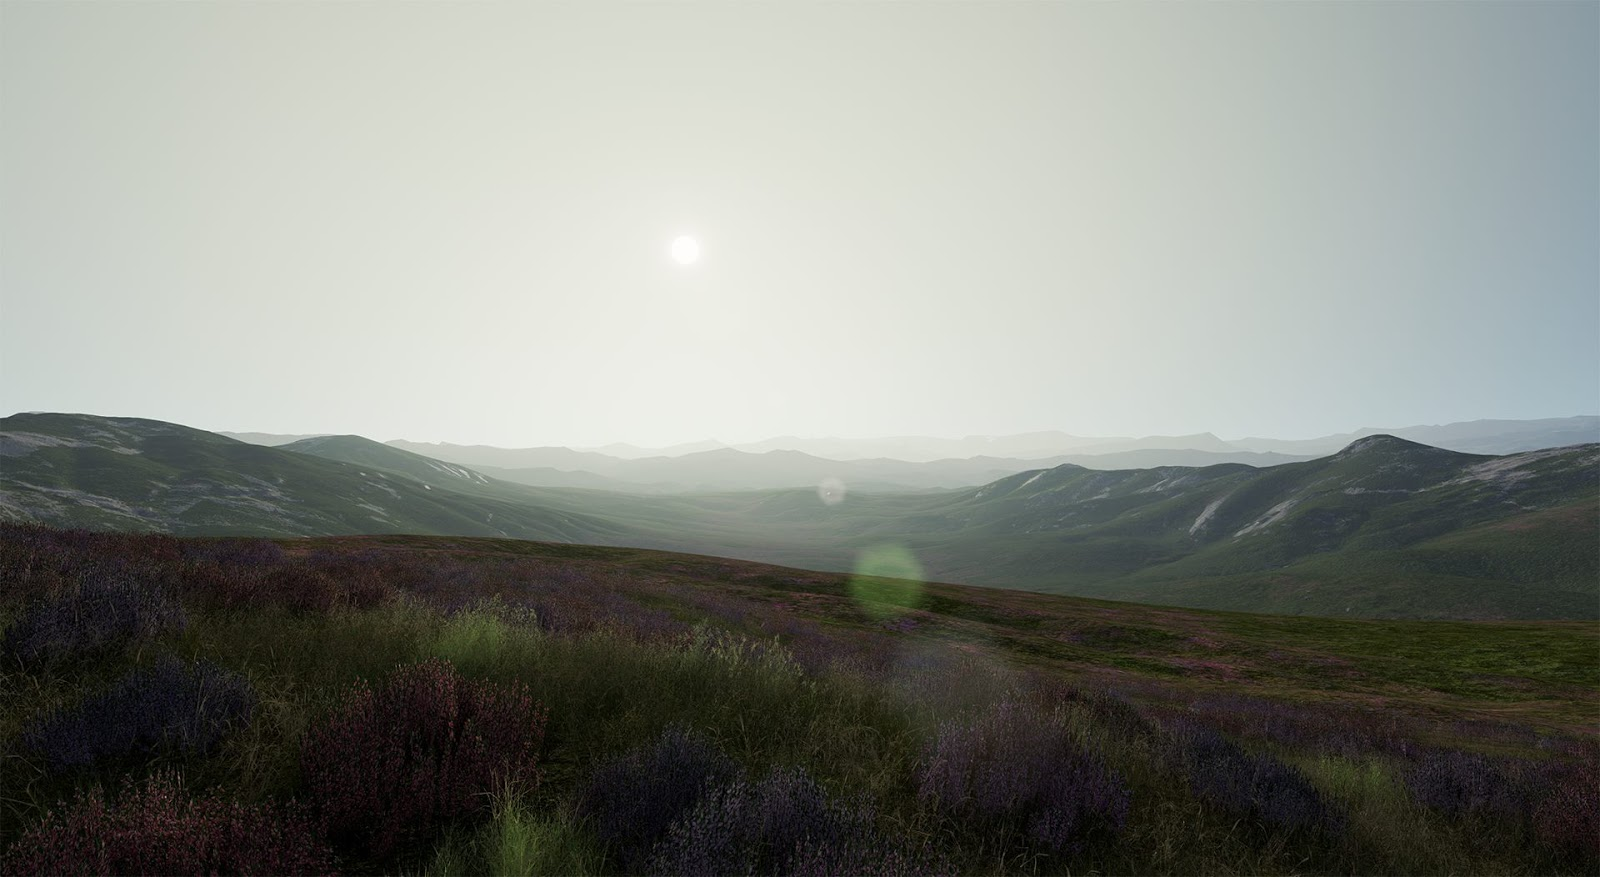 Unreal Engine Photorealistic Landscape Pack 4   Computer Graphics